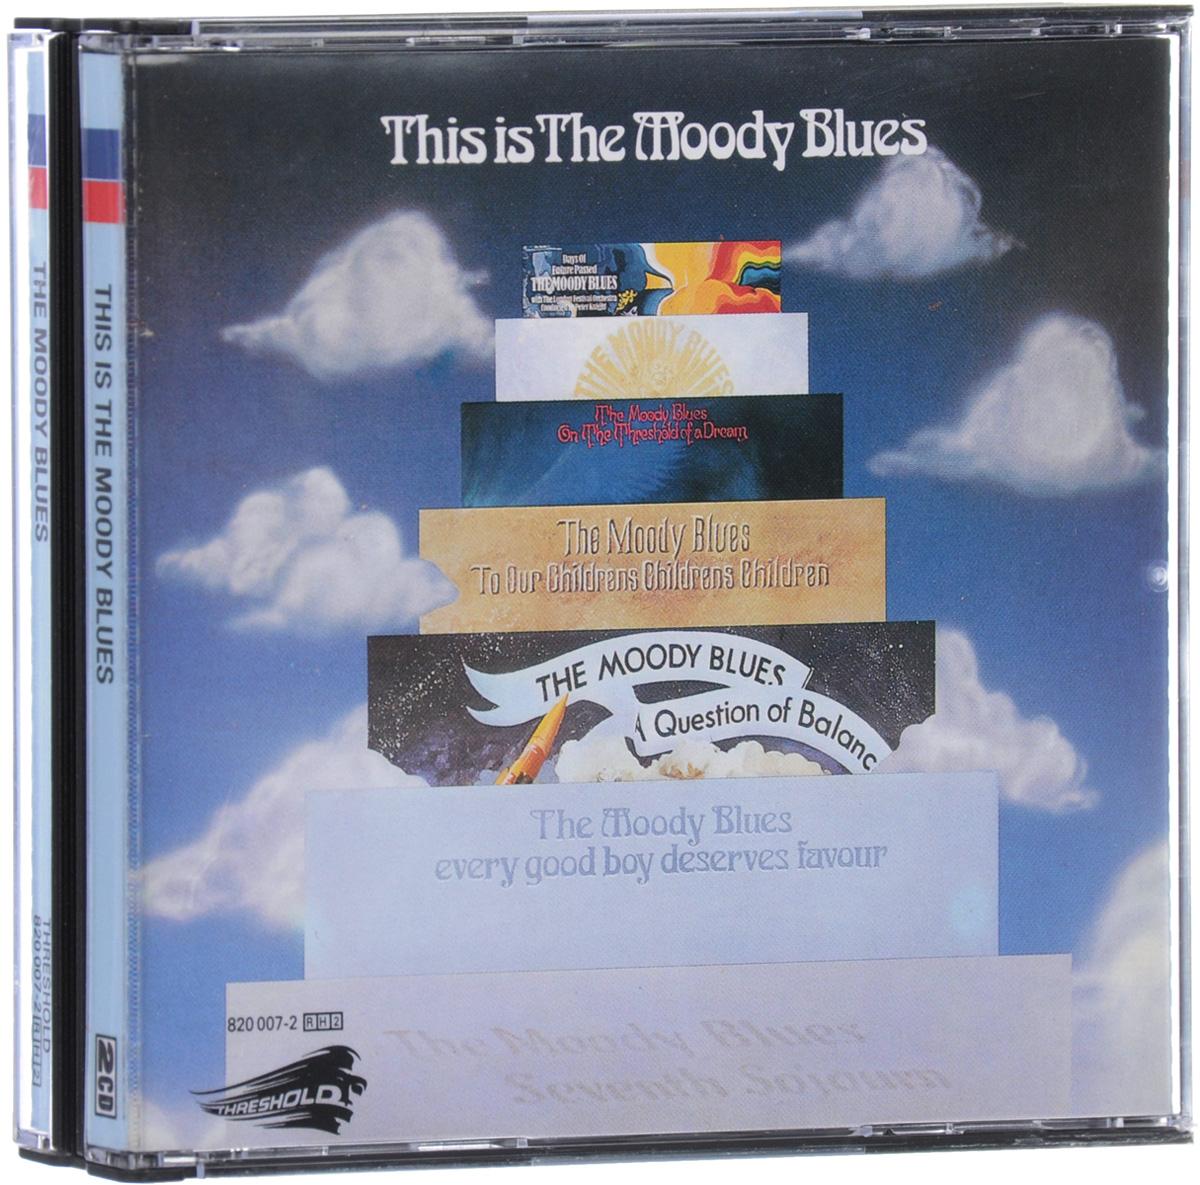 The Moody Blues The Moody Blues. This Is The Moody Blues (2 CD) blues band the blues band wire less